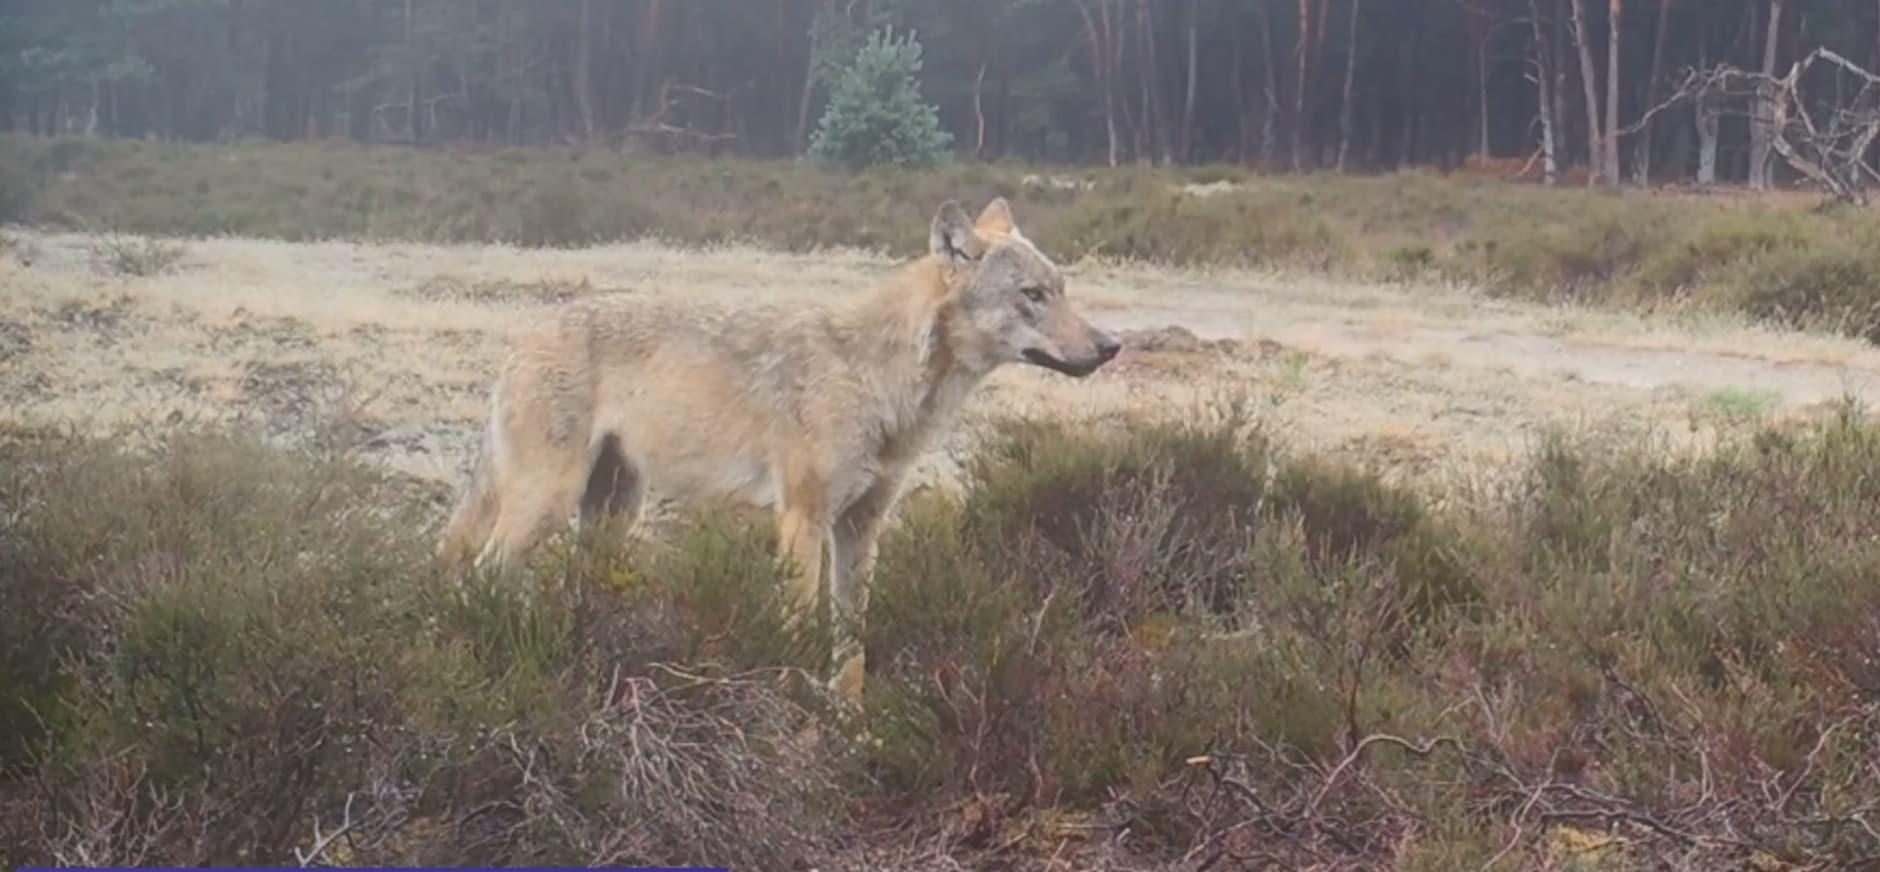 De wolf in de zomer - wolfblog